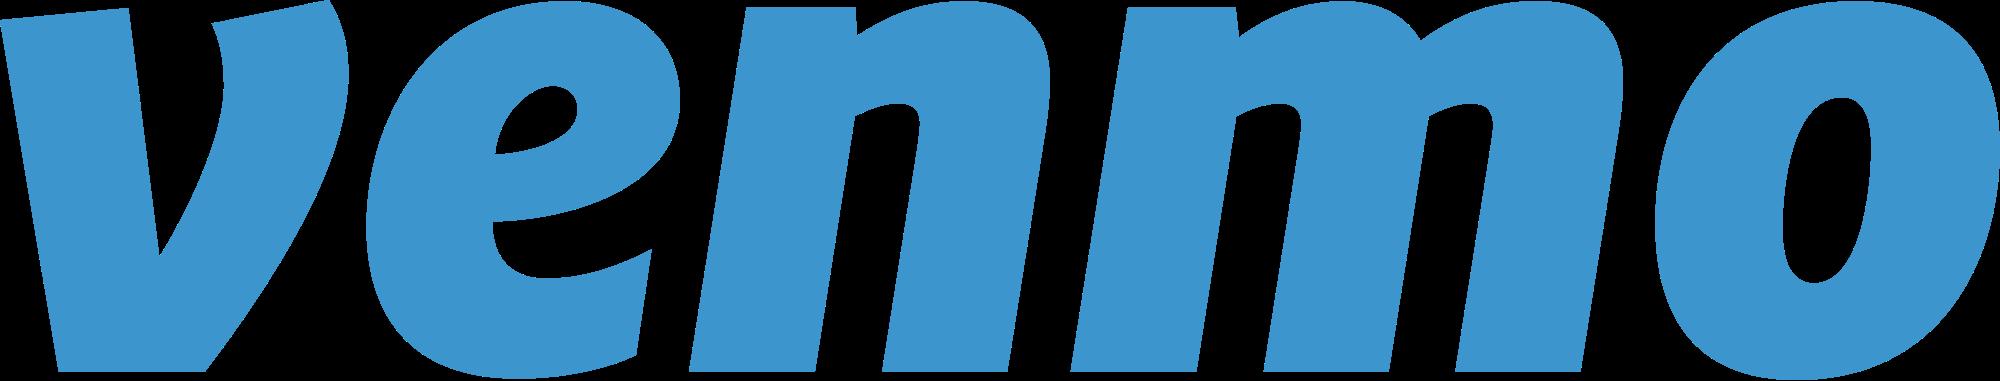 Venmo - payment - fintechnews